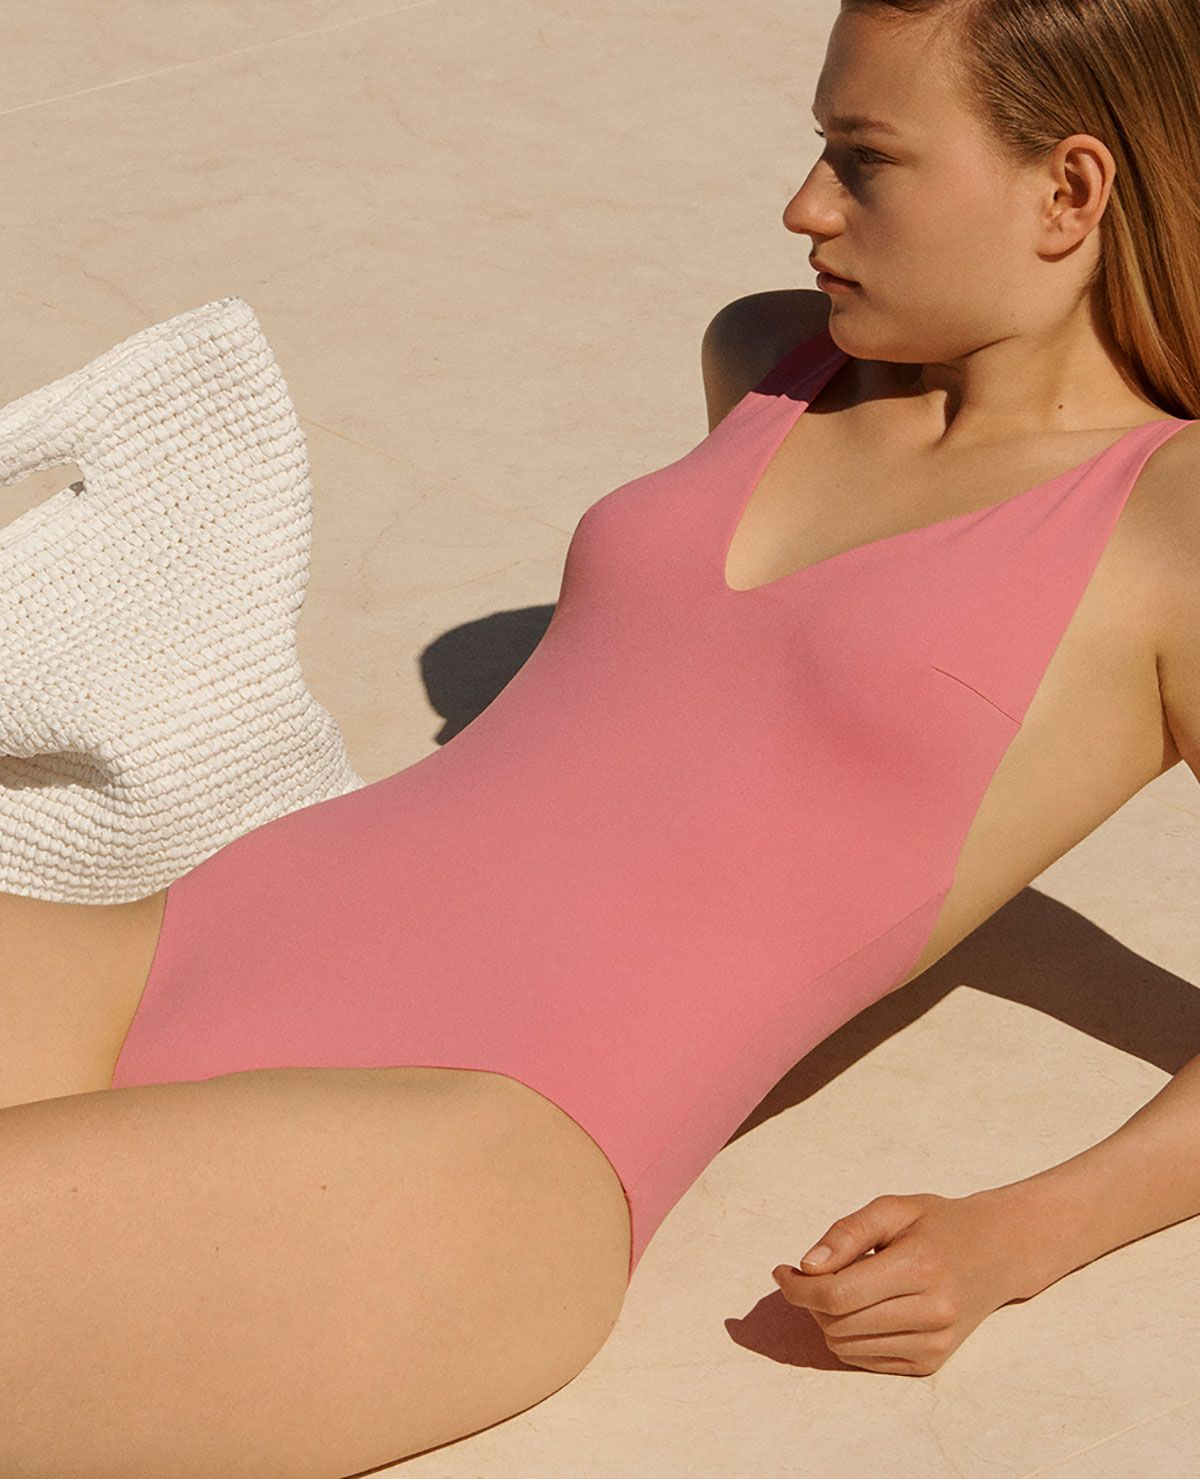 f91adff7205 COS | New swimwear | Swimwear in 2019 | Swimwear, Fashion, Bathing suits